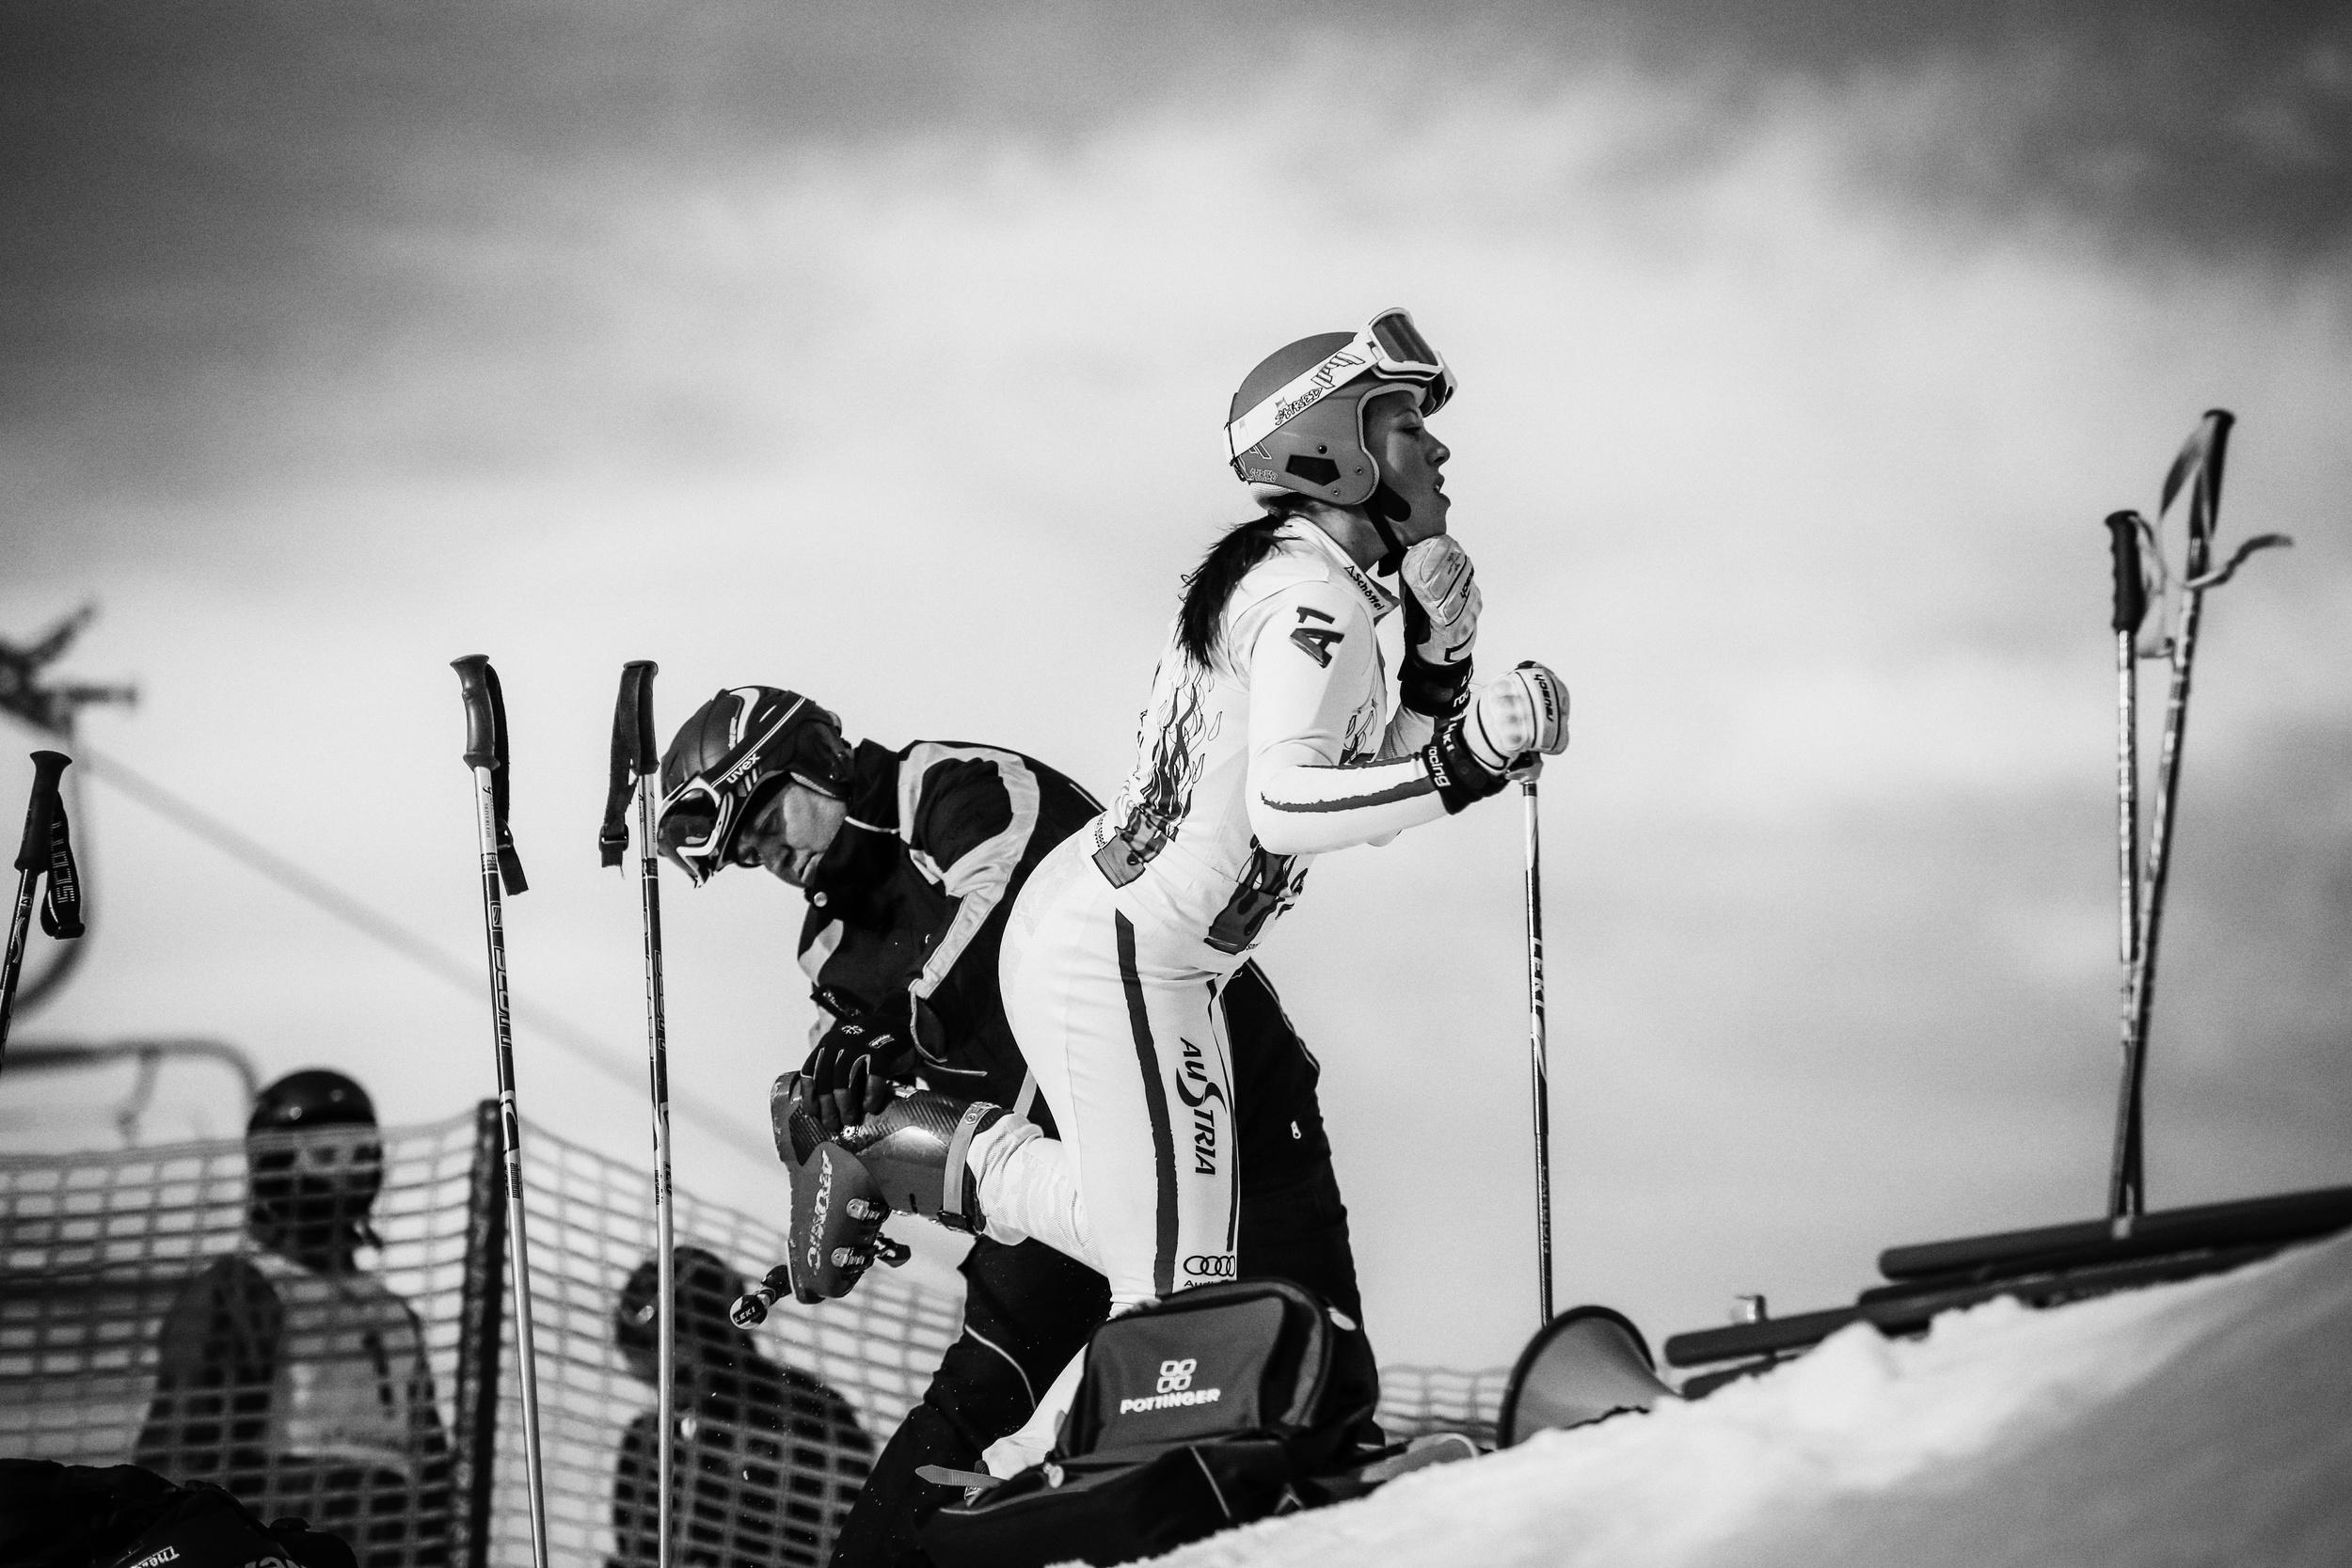 ski preparation.jpeg